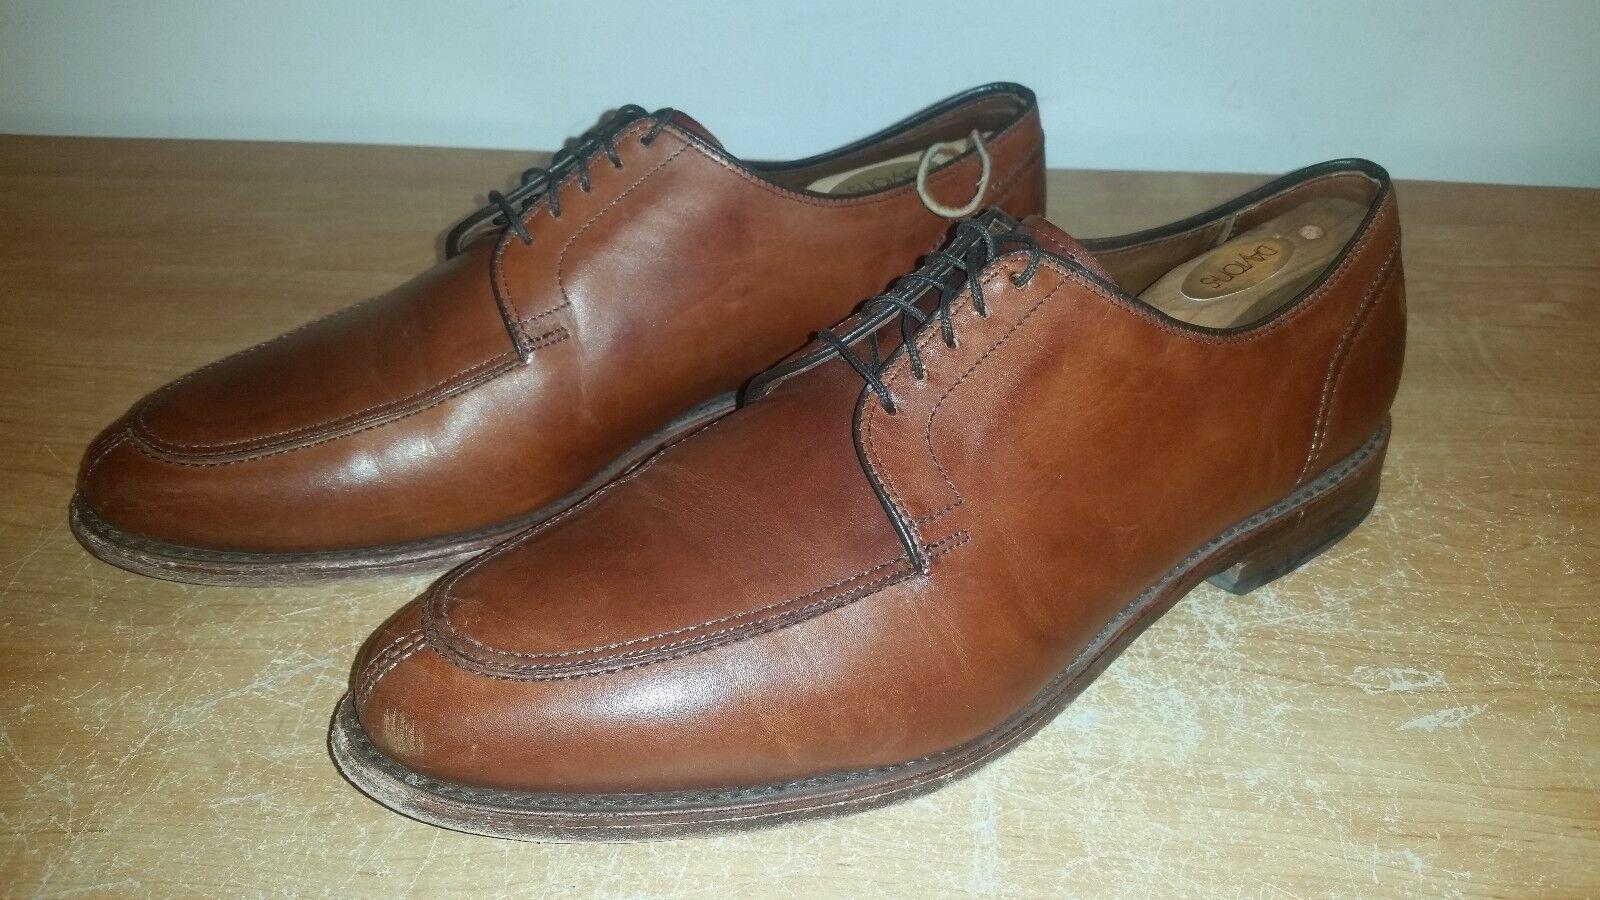 Chili Brown Calfskin ALLEN EDMONDS LaSalle Split Toe Blutcher Dress Shoes Sz-11D Scarpe classiche da uomo